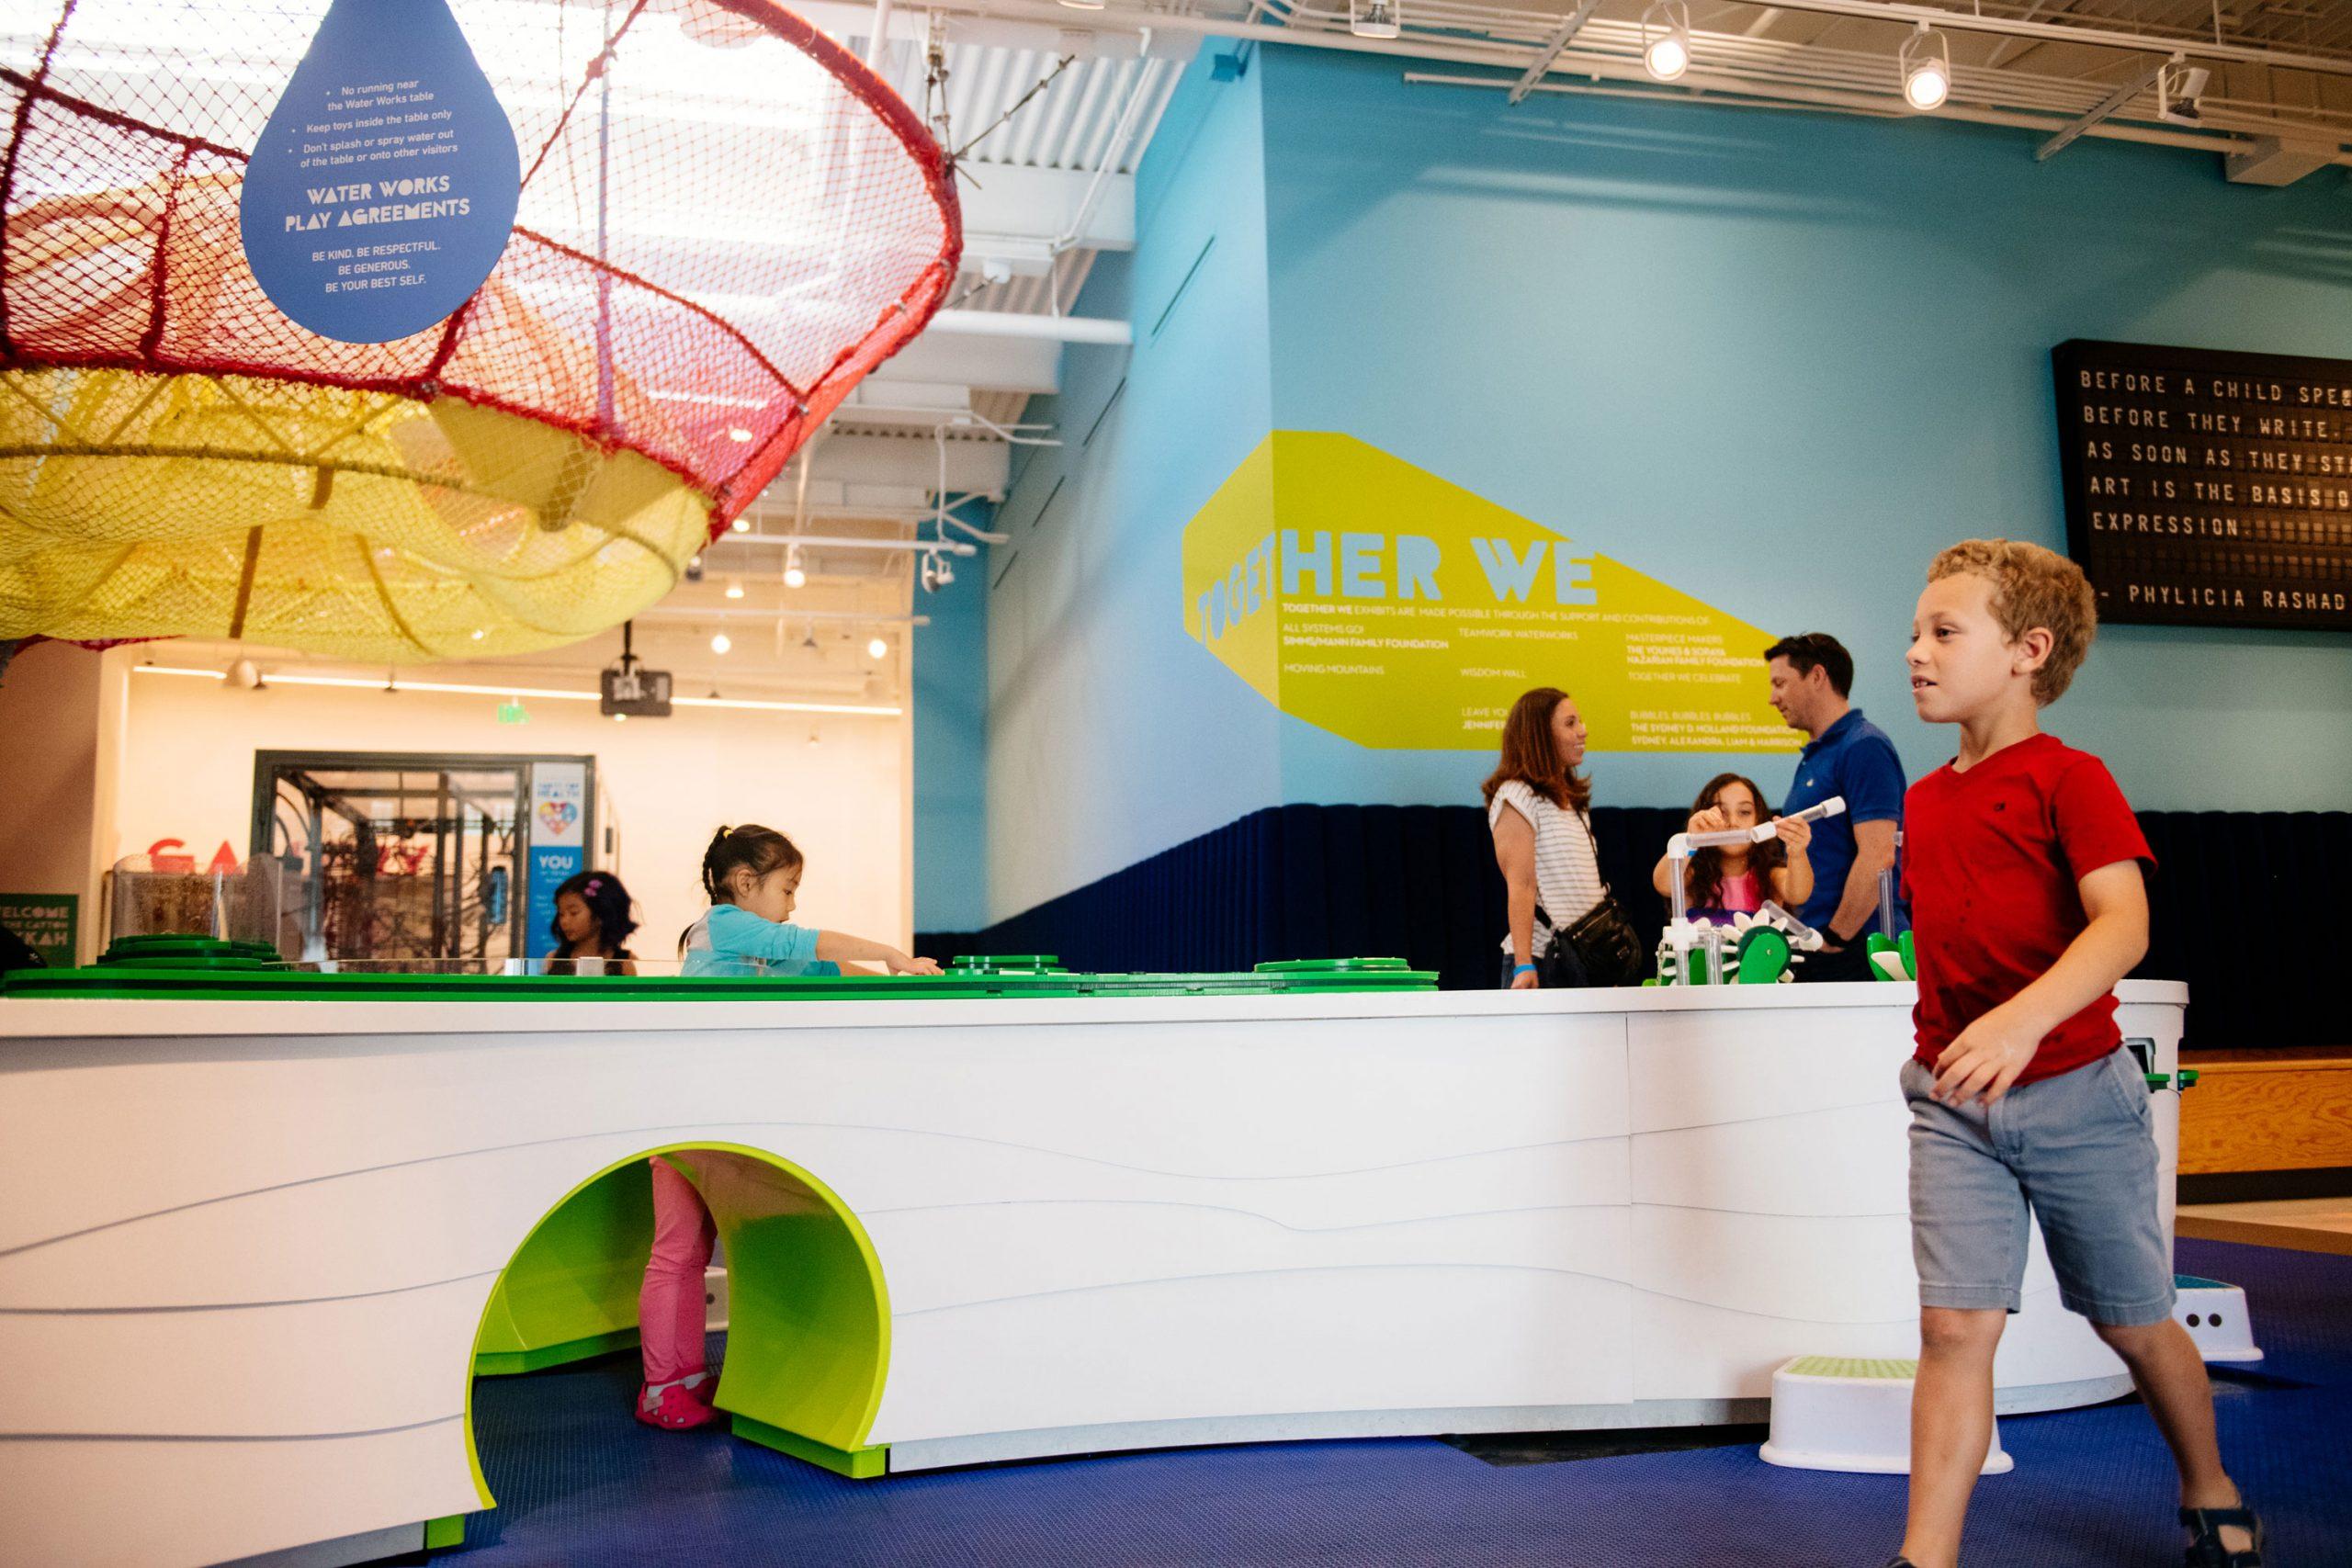 The Cayton Children's Museum: A Photo Essay